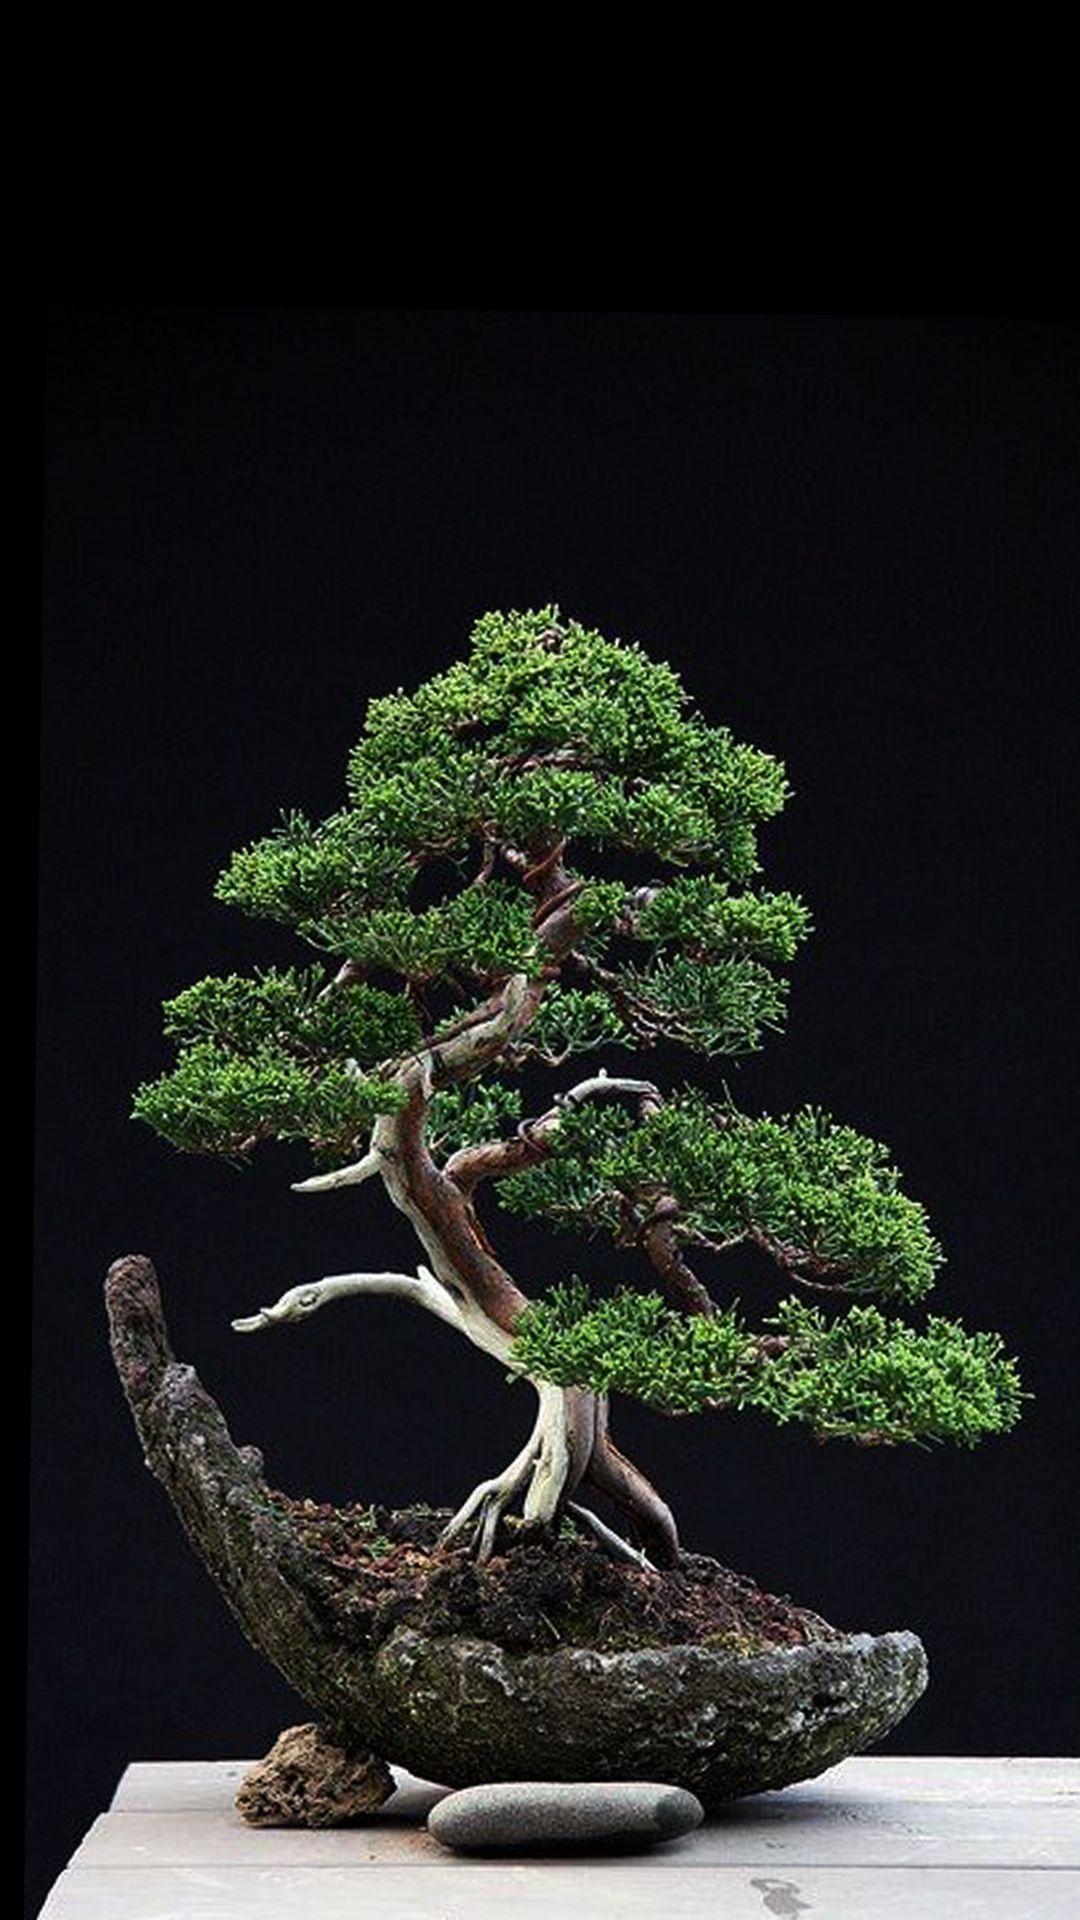 Bonsai Tree Wallpaper : bonsai, wallpaper, Bonsai, Wallpapers, Backgrounds, WallpaperAccess